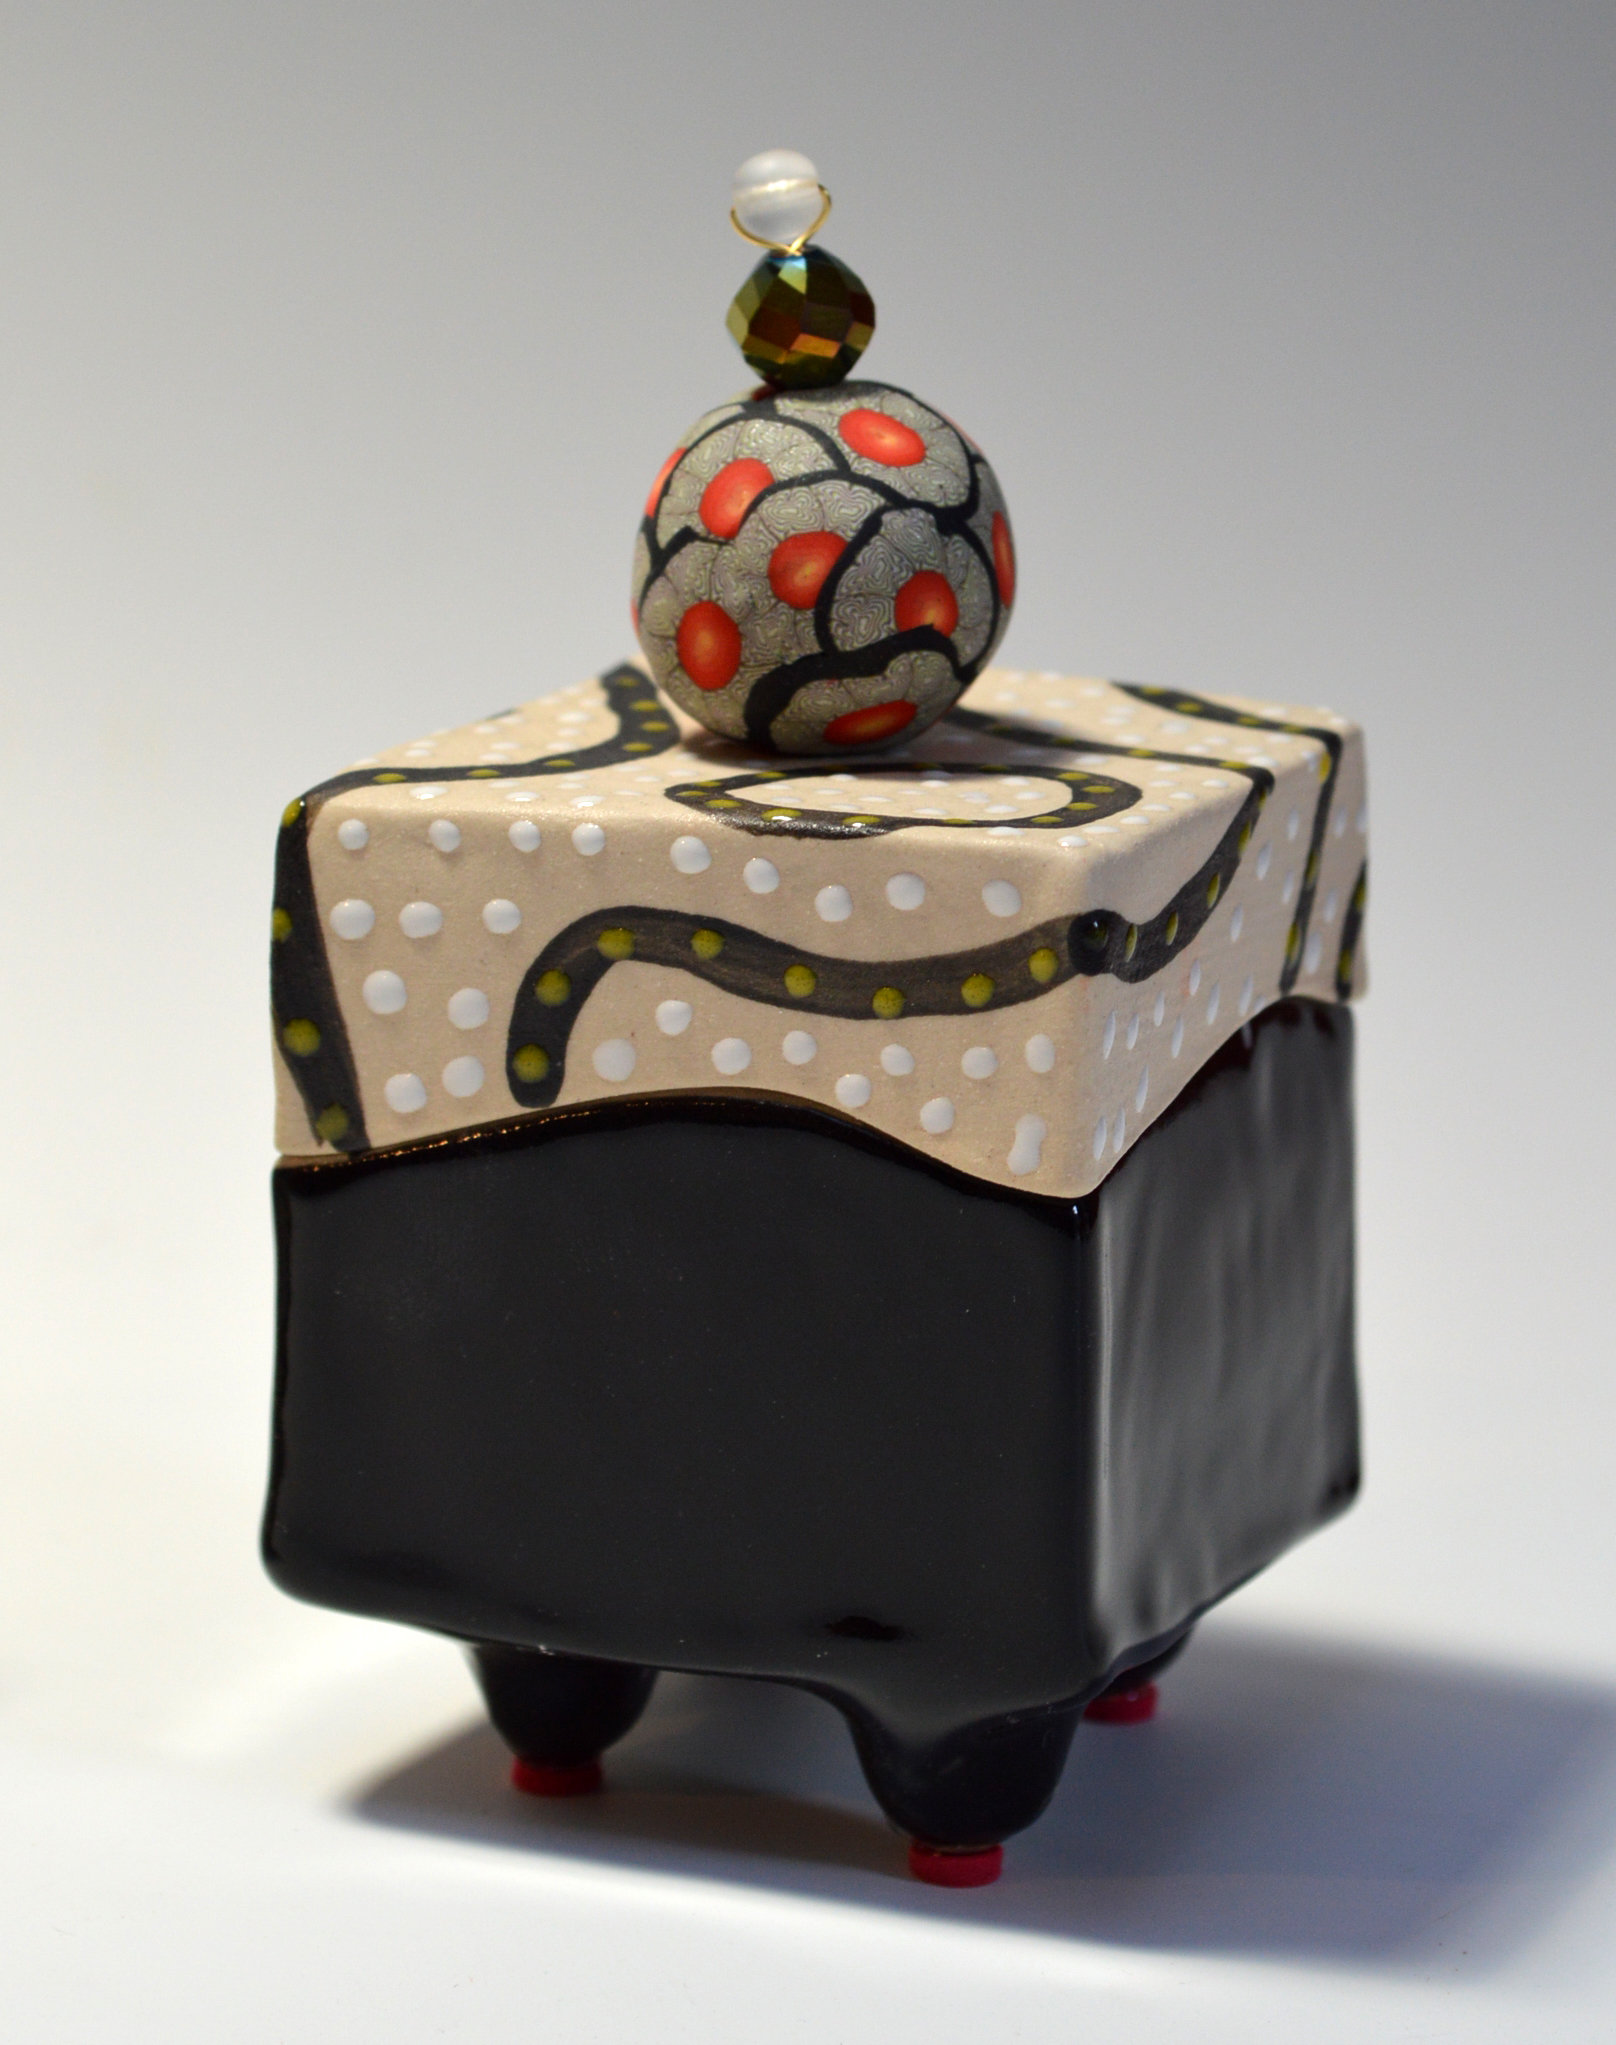 Blackline Halfsie Box By Vaughan Nelson Ceramic Box Artful Home